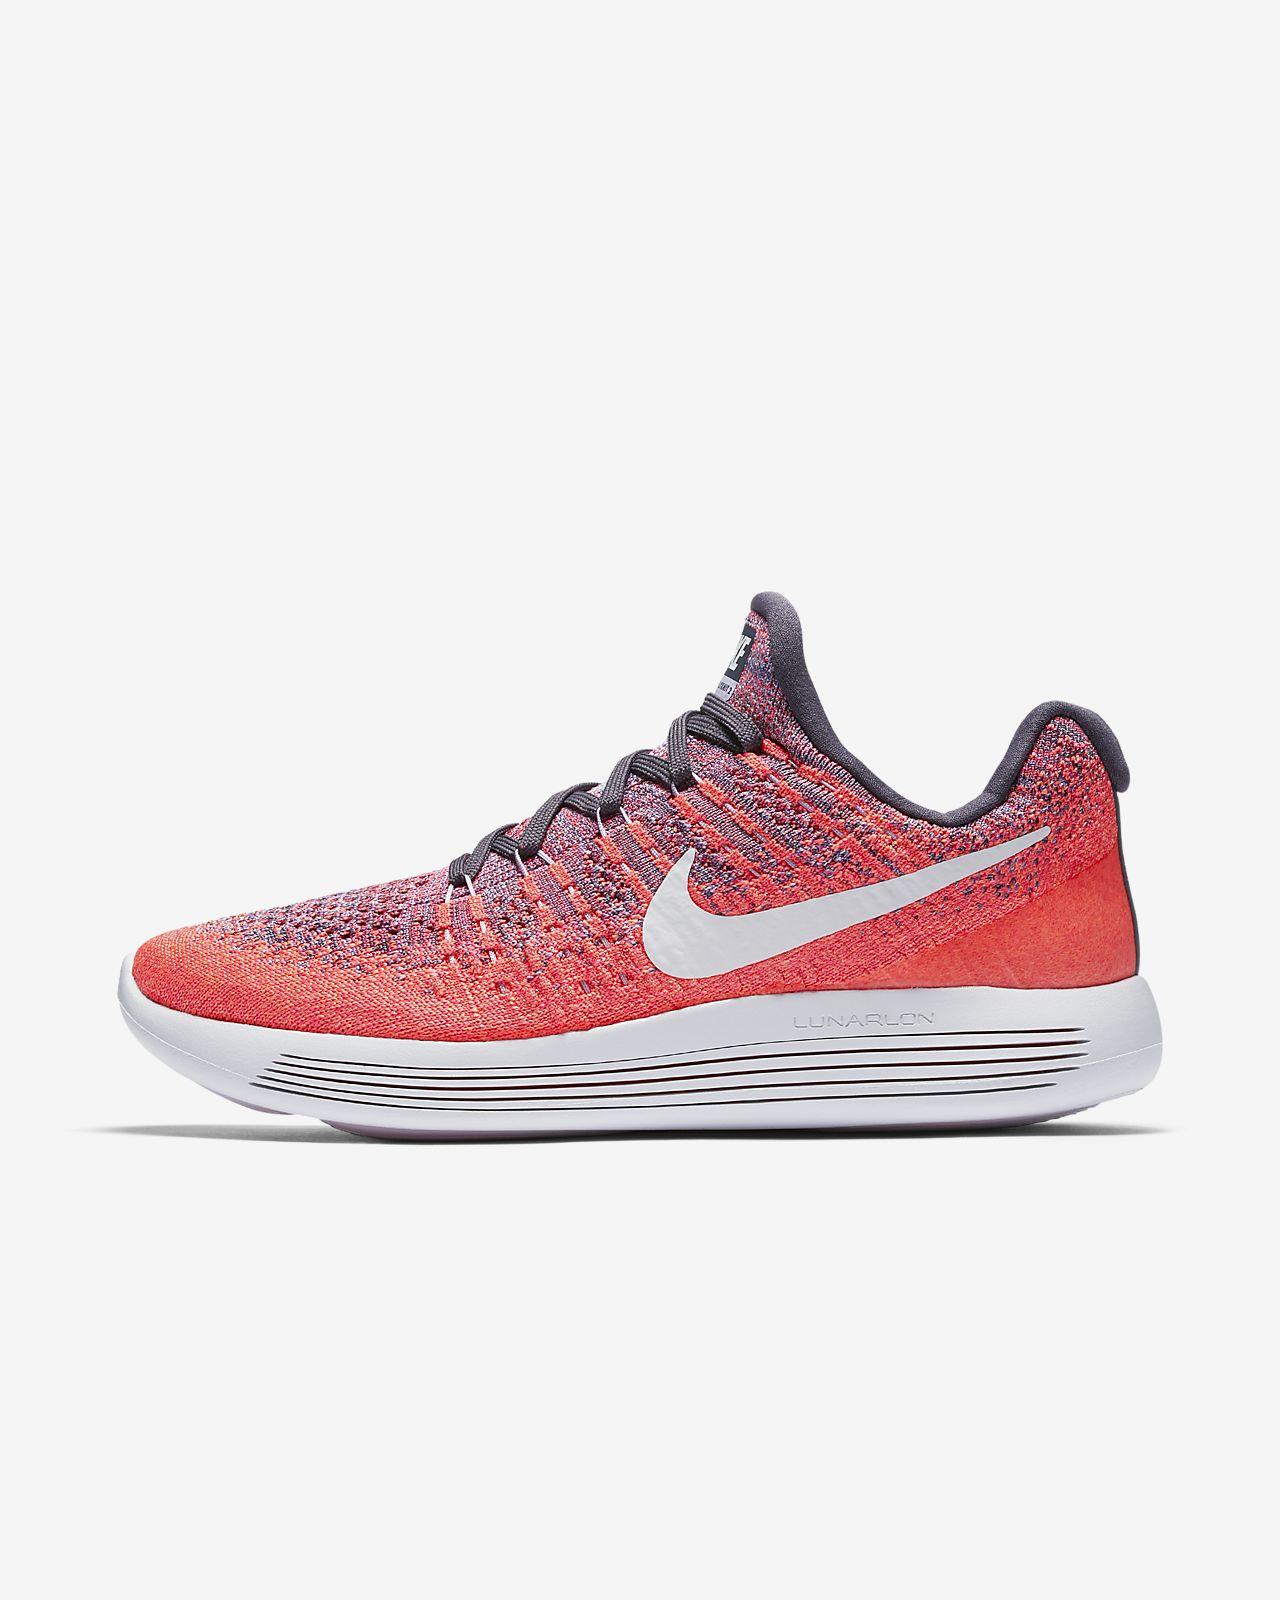 ... Nike LunarEpic Low Flyknit 2 Women\u0027s Running Shoe